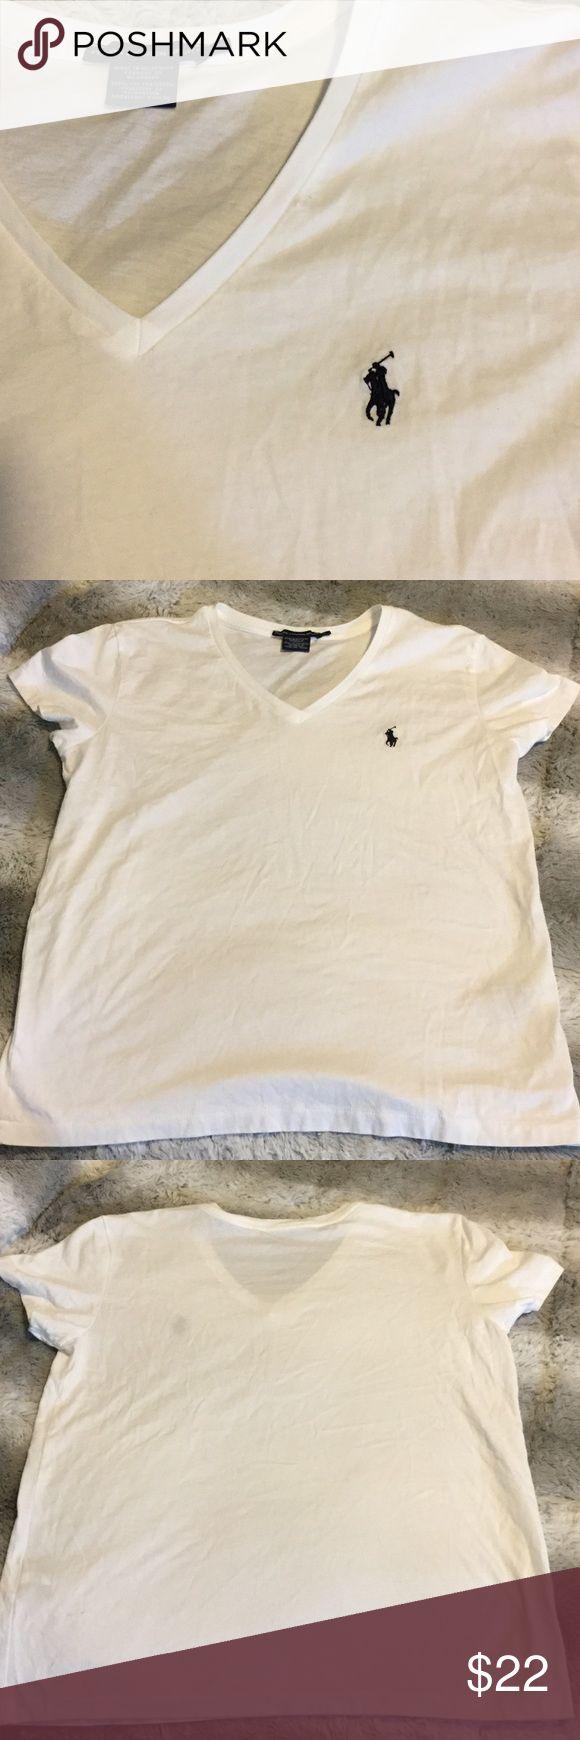 Polo Tshirt NWOT Polo Tshirt / Sz L / 100% Cotton Polo by Ralph Lauren Tops Tees - Short Sleeve